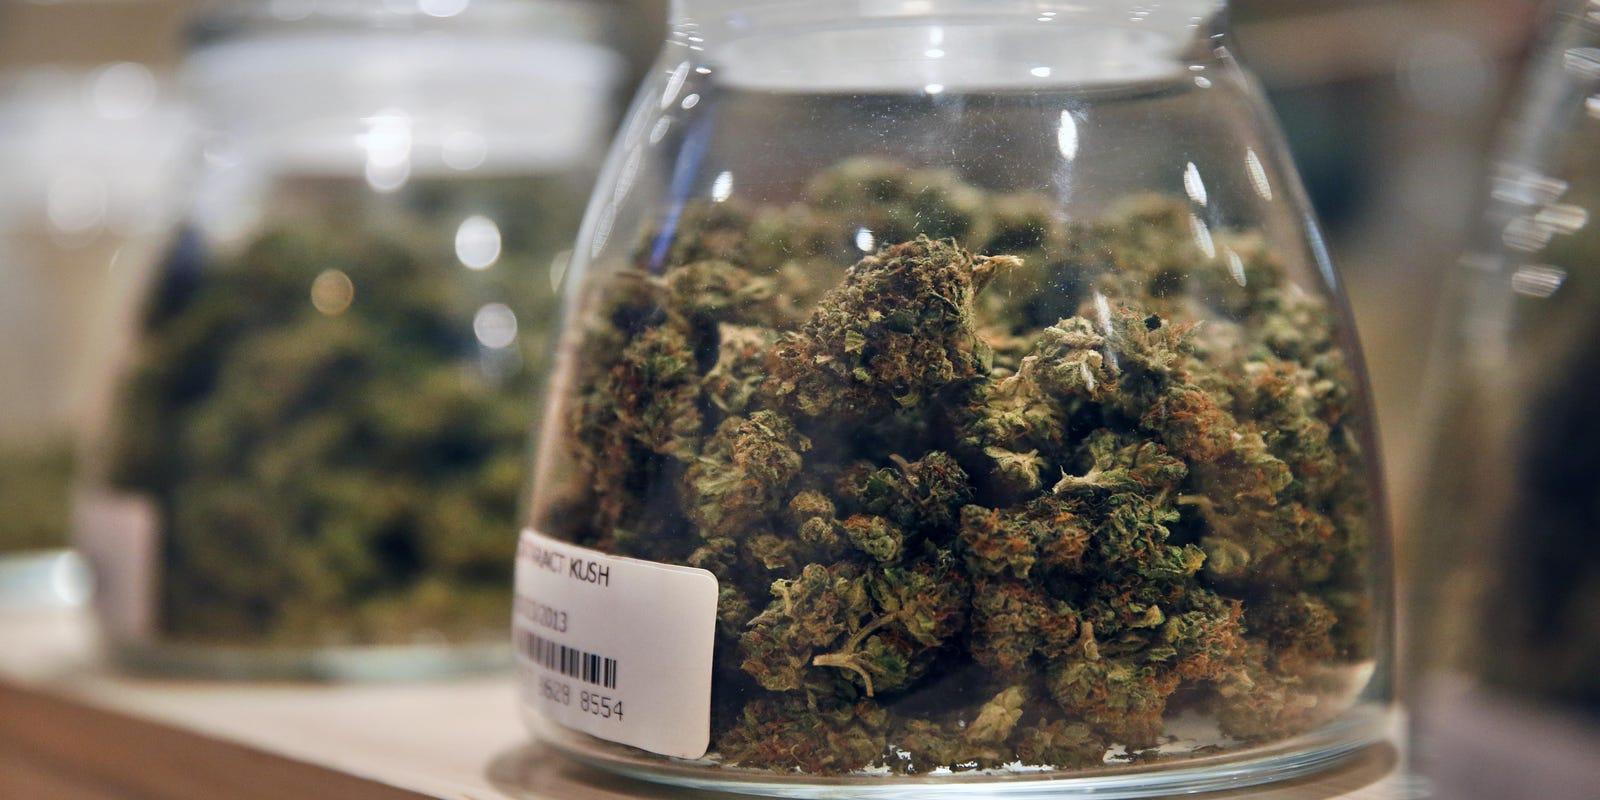 Missouri medical marijuana: 192 dispensaries by 2020